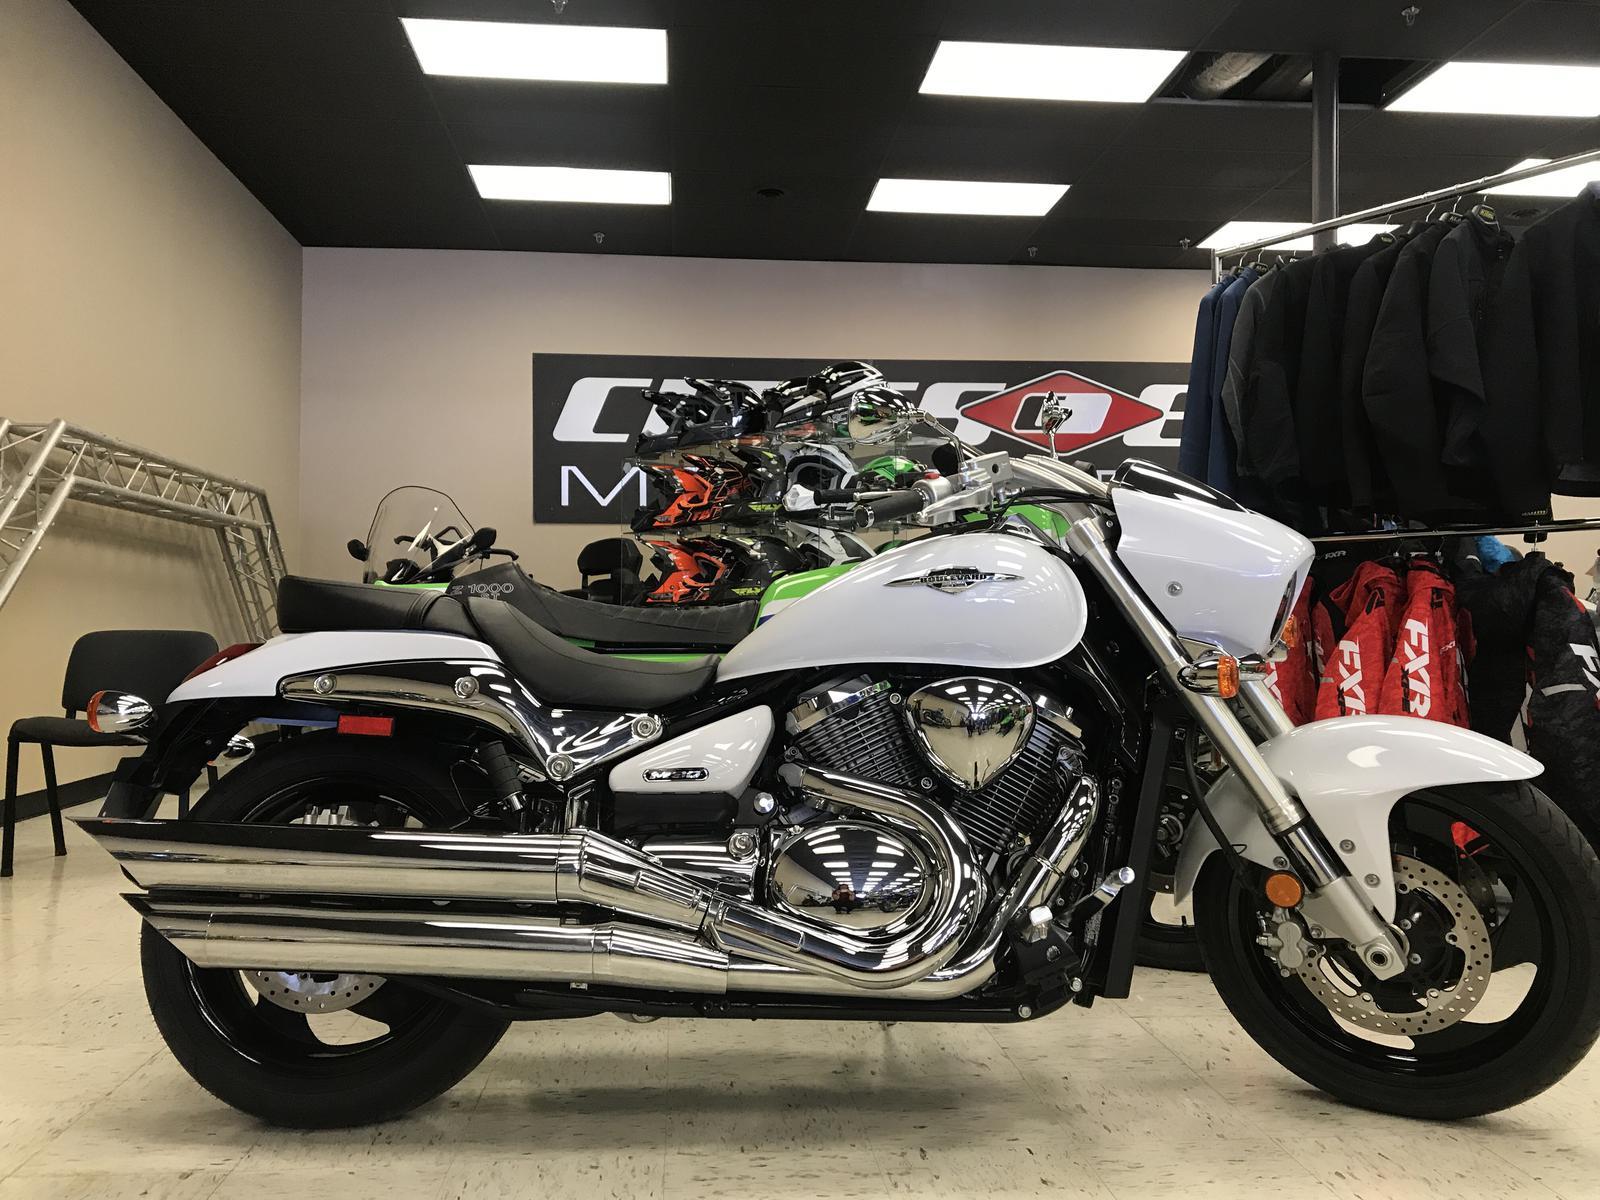 2015 Suzuki BOULEVARD M90 for sale in Shakopee, MN. Cities Edge ...